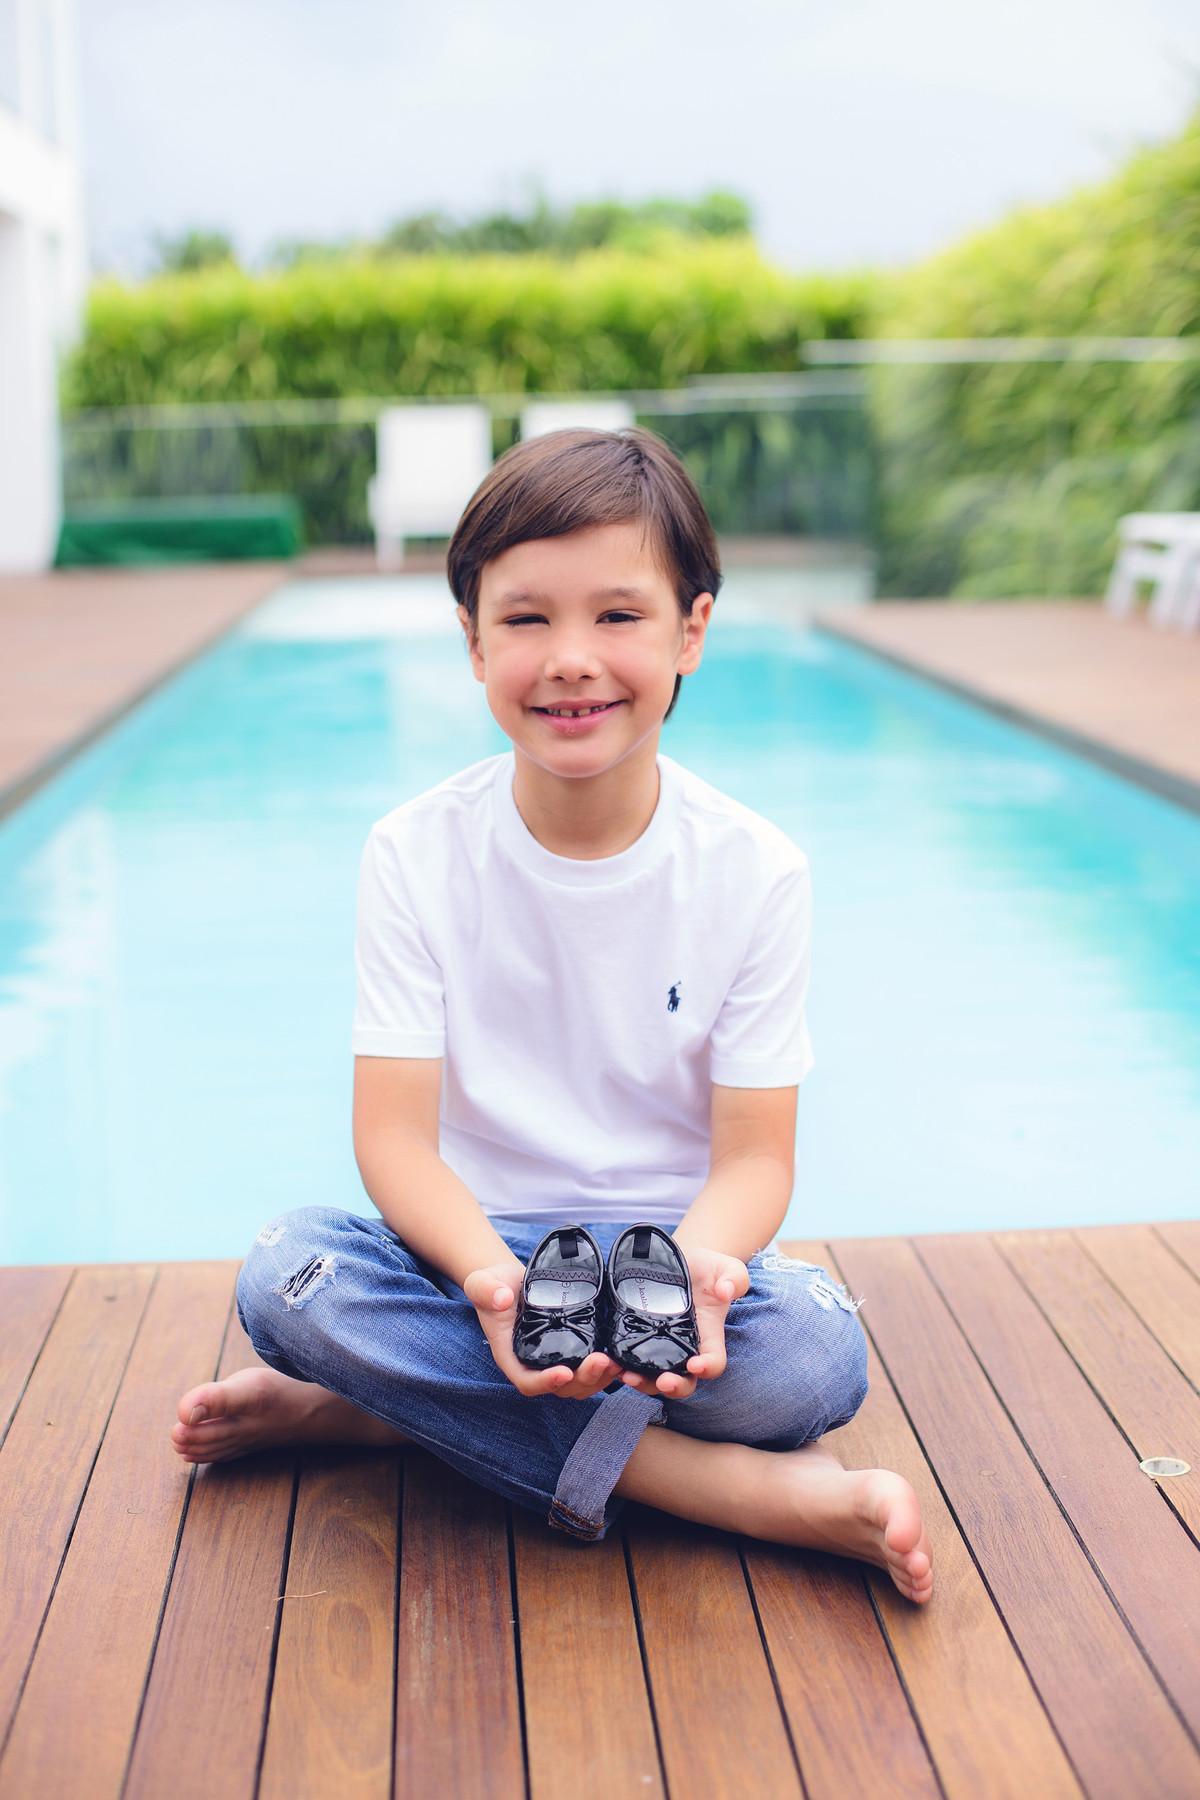 chroma foto - chroma fotografia - ensaio gestante - jaraguá do sul - fotografos de jaraguá do sul - gestante - ensaio mãe e filho - ensaio fotográfico